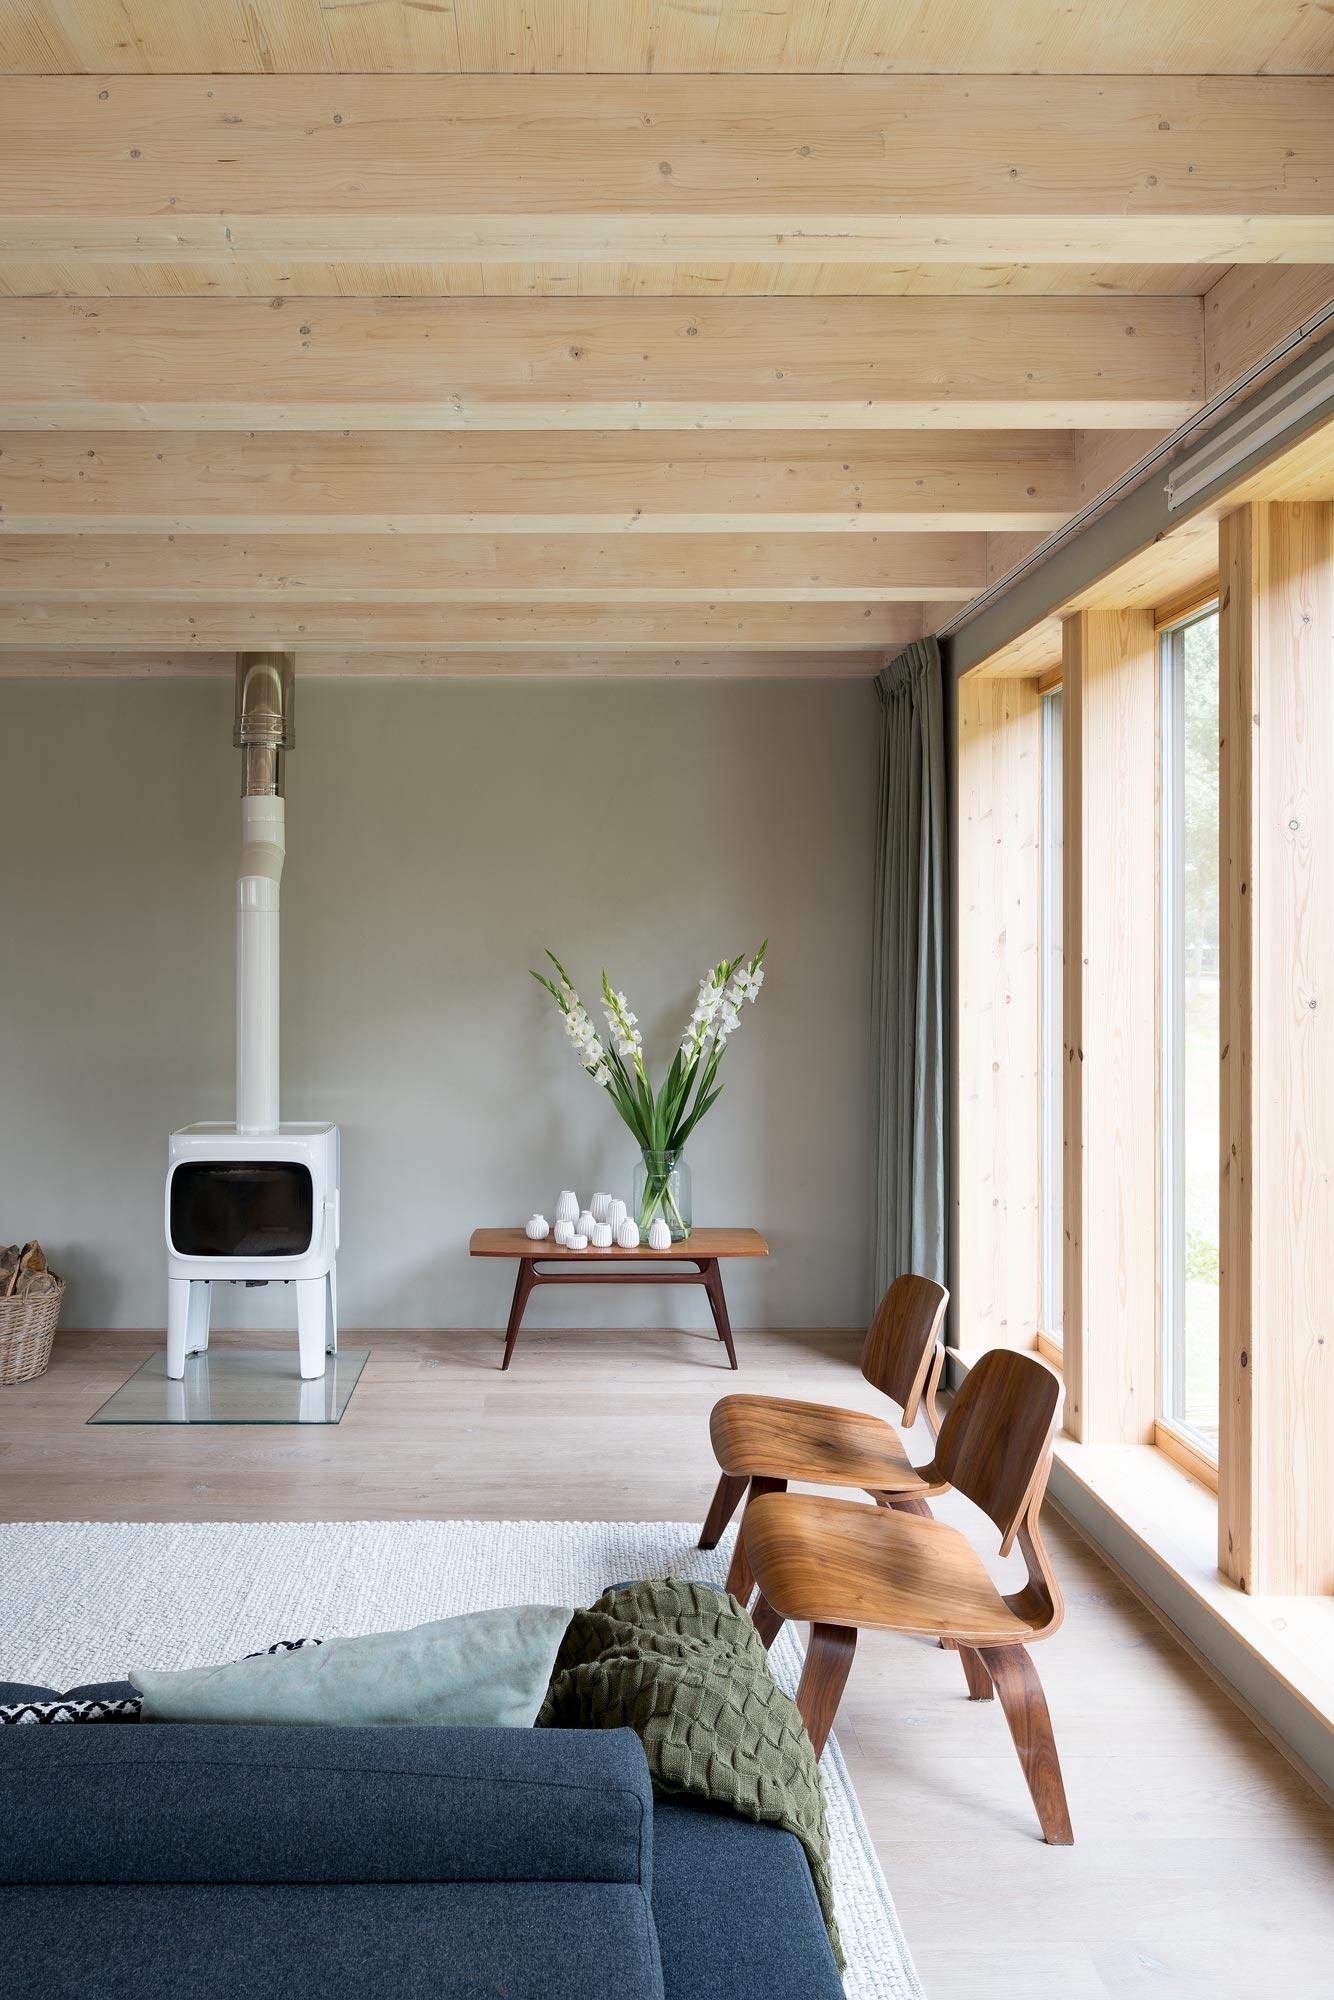 Interieur nieuwbouw woning, Driemond - Interieurfotograaf Chiel de Nooyer